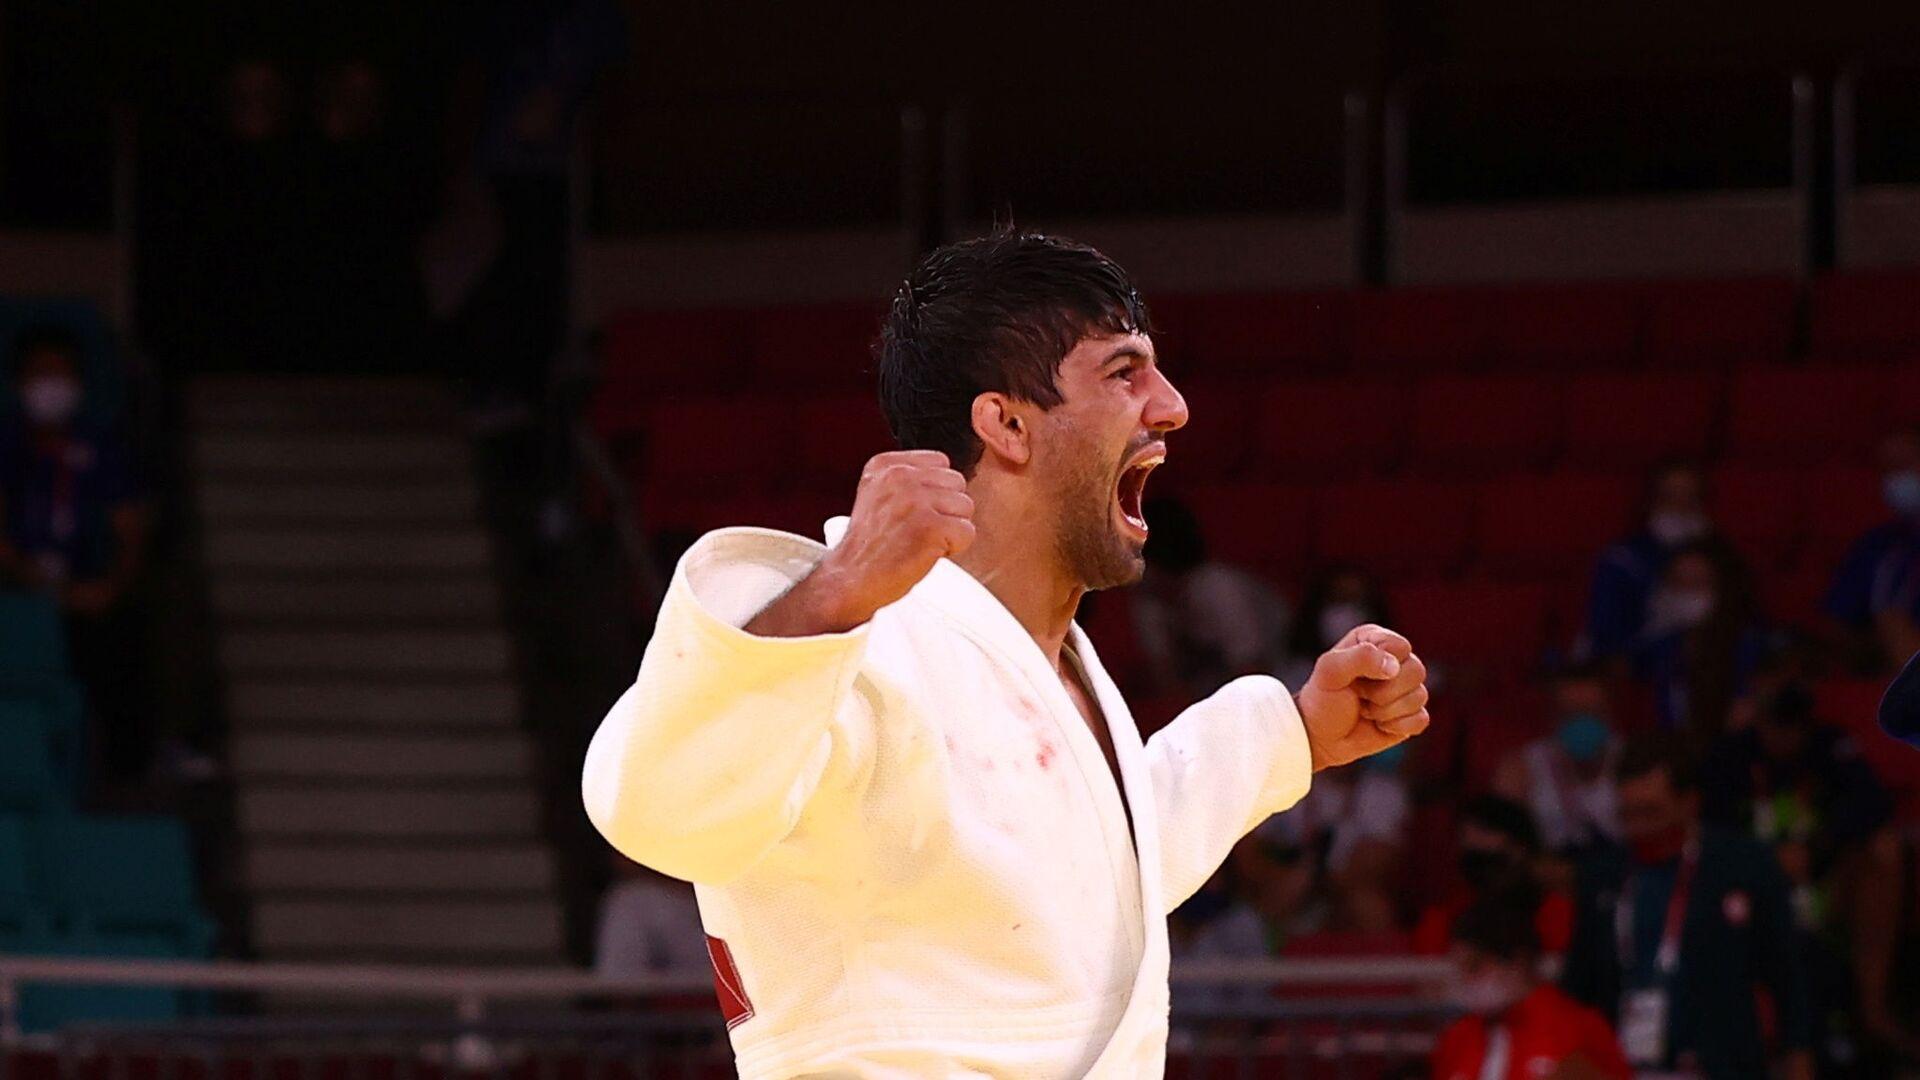 Лаша Шавдатуашвили на Олимпиаде в Токио радуется победе - Sputnik საქართველო, 1920, 24.08.2021